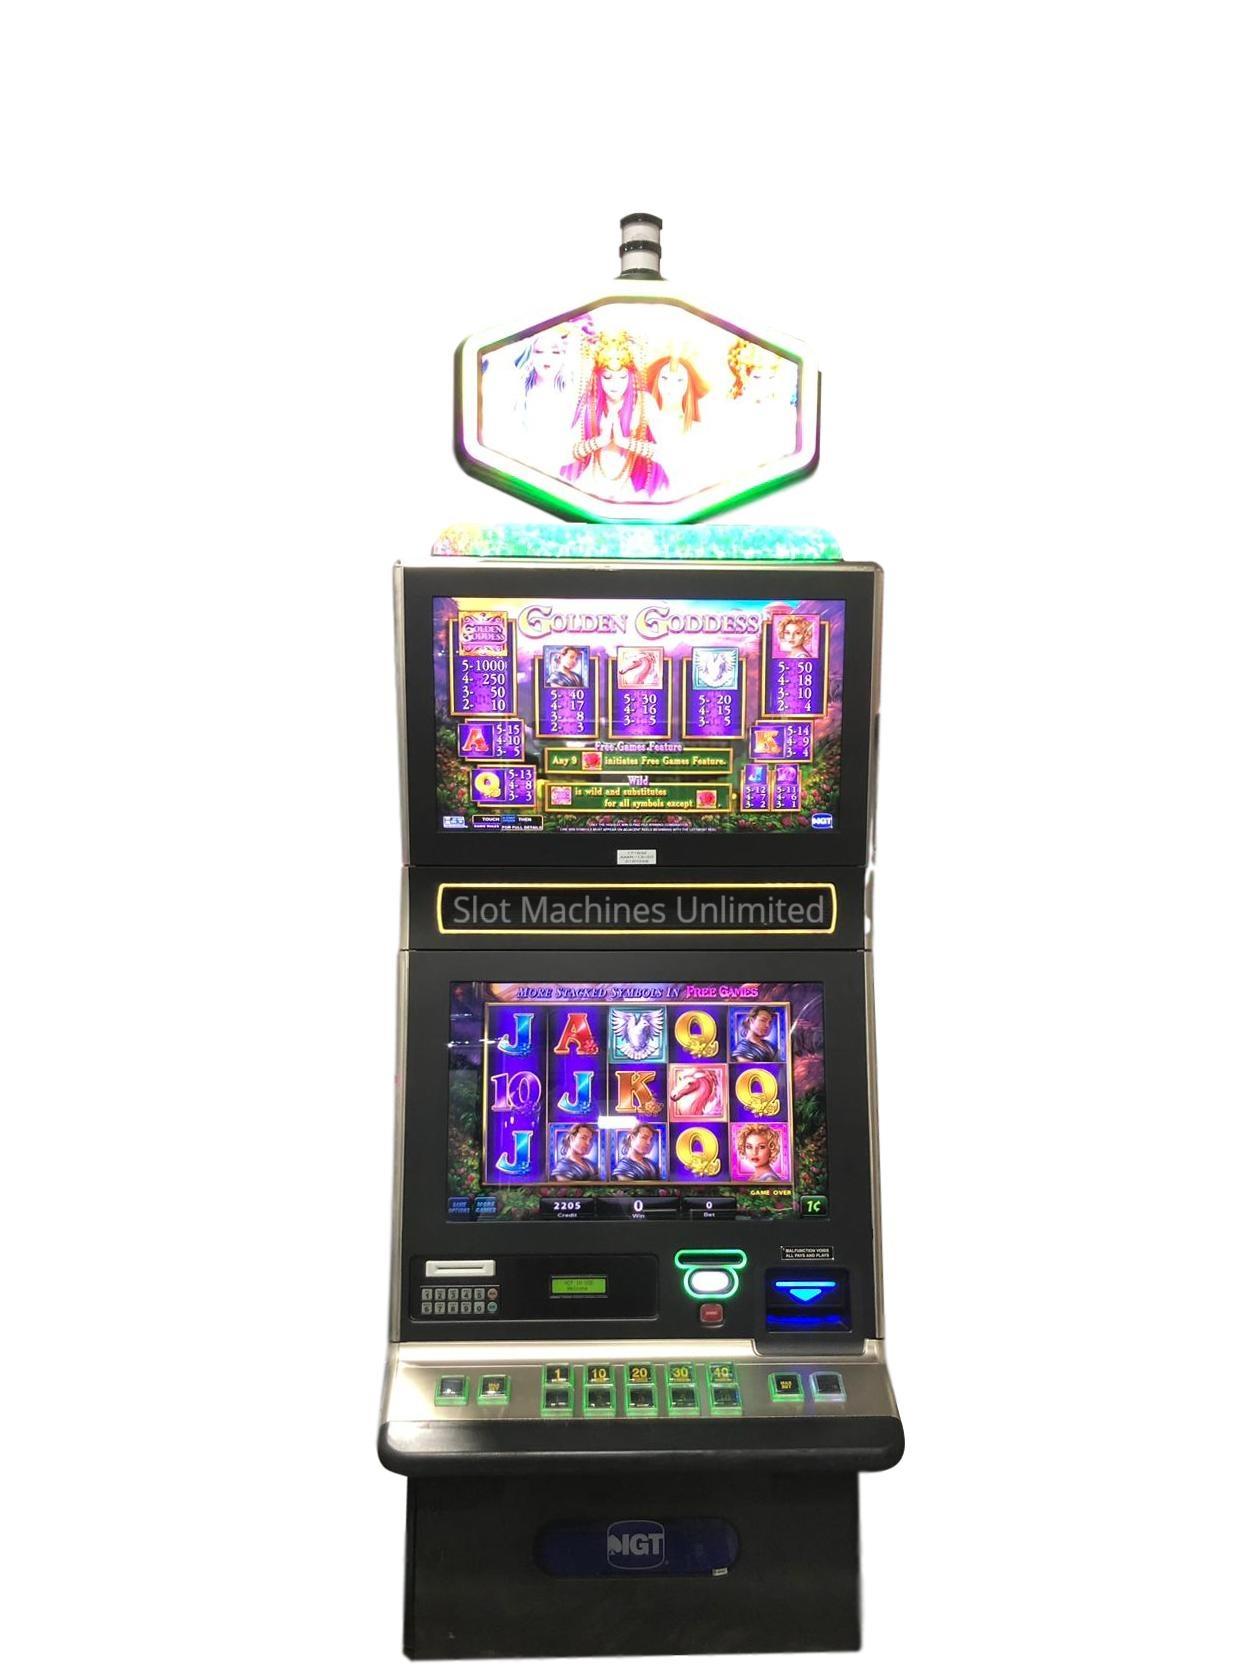 888 casino get 88 free